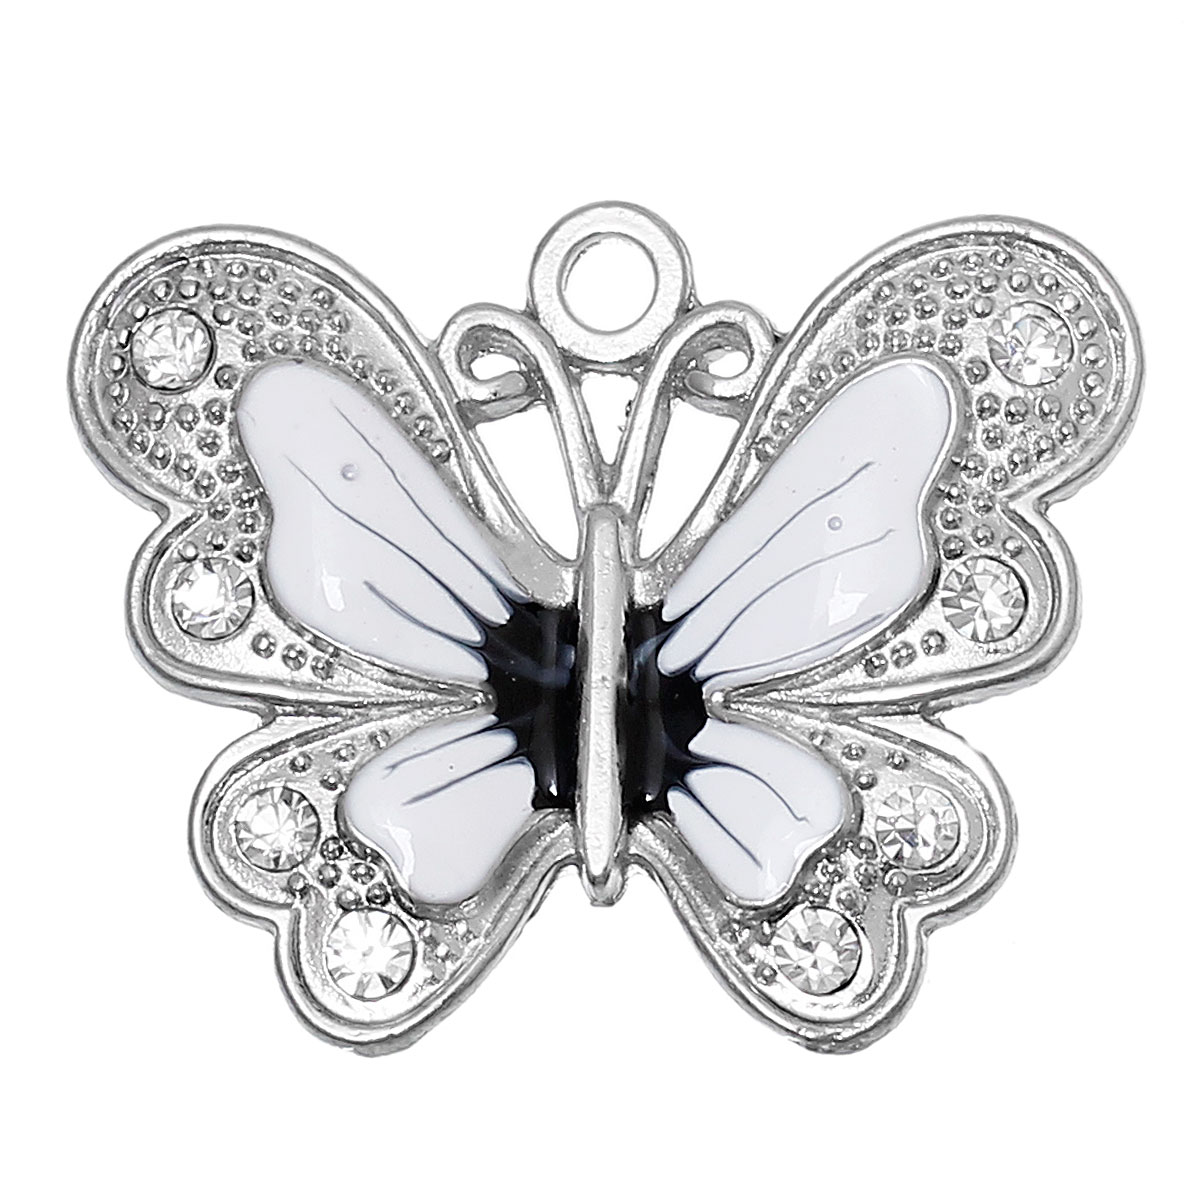 1 Stück Duftendes Aroma Doreenbeads Zink Metall Legierung Strass Charm Anhänger Schmetterling Antike Silber Weiß Klar Strass Emaille 34mm X 27mm Anhänger